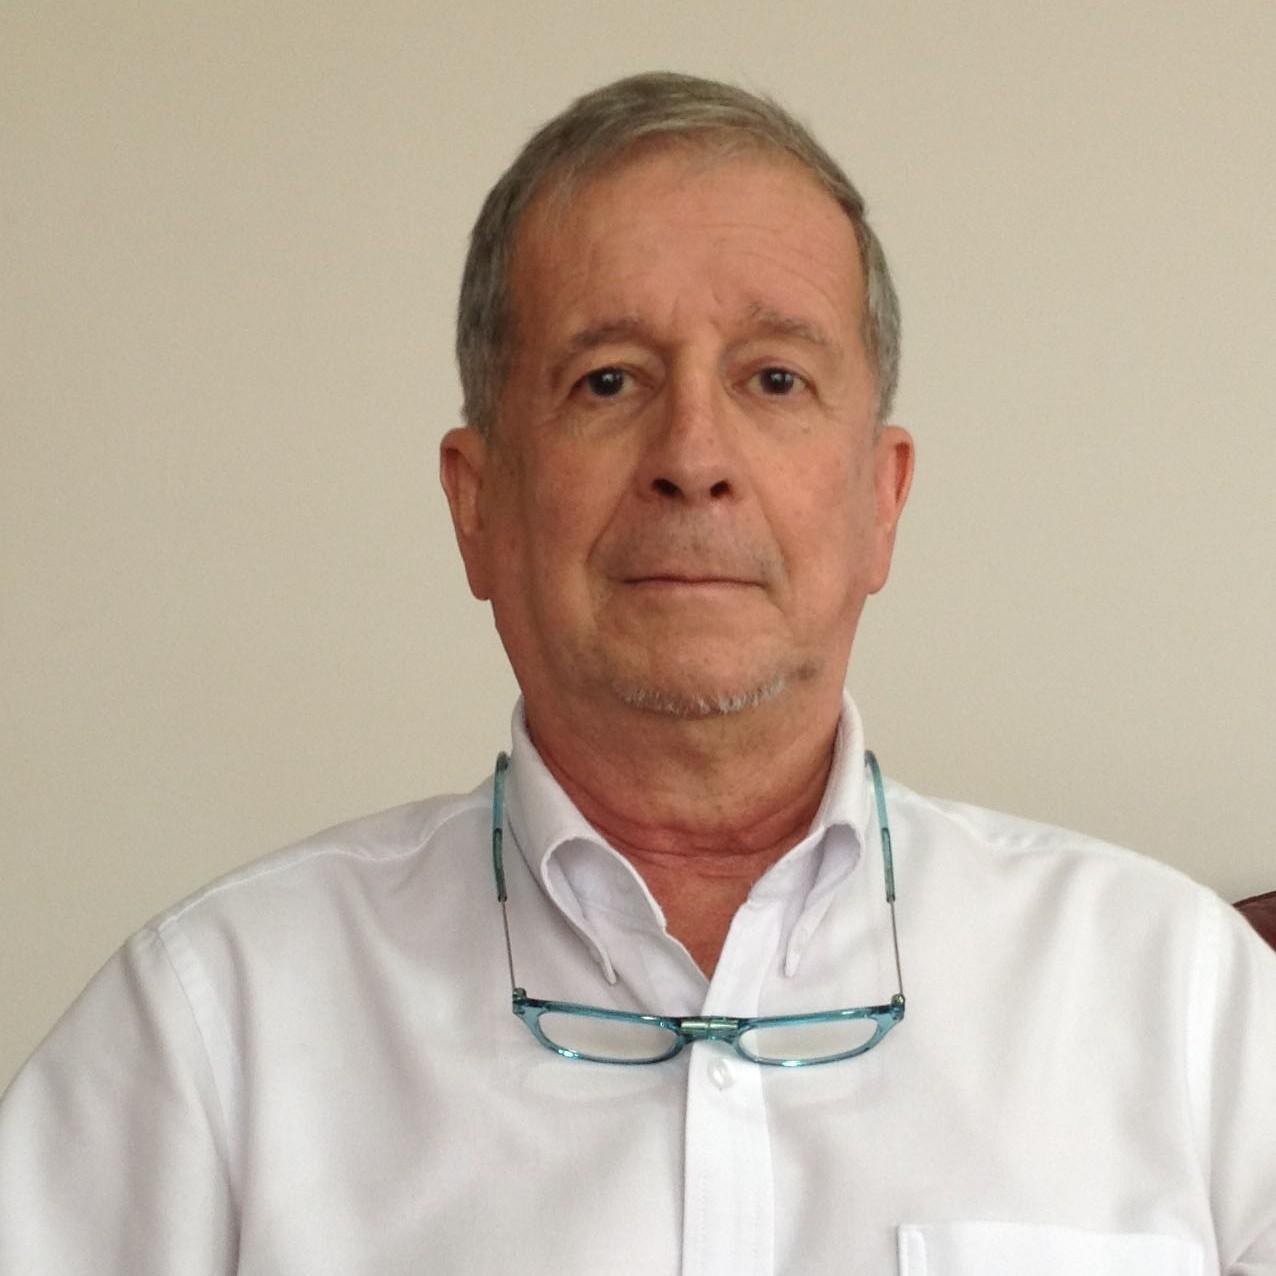 Dr. Elkin Lucena Quevedo. BMR